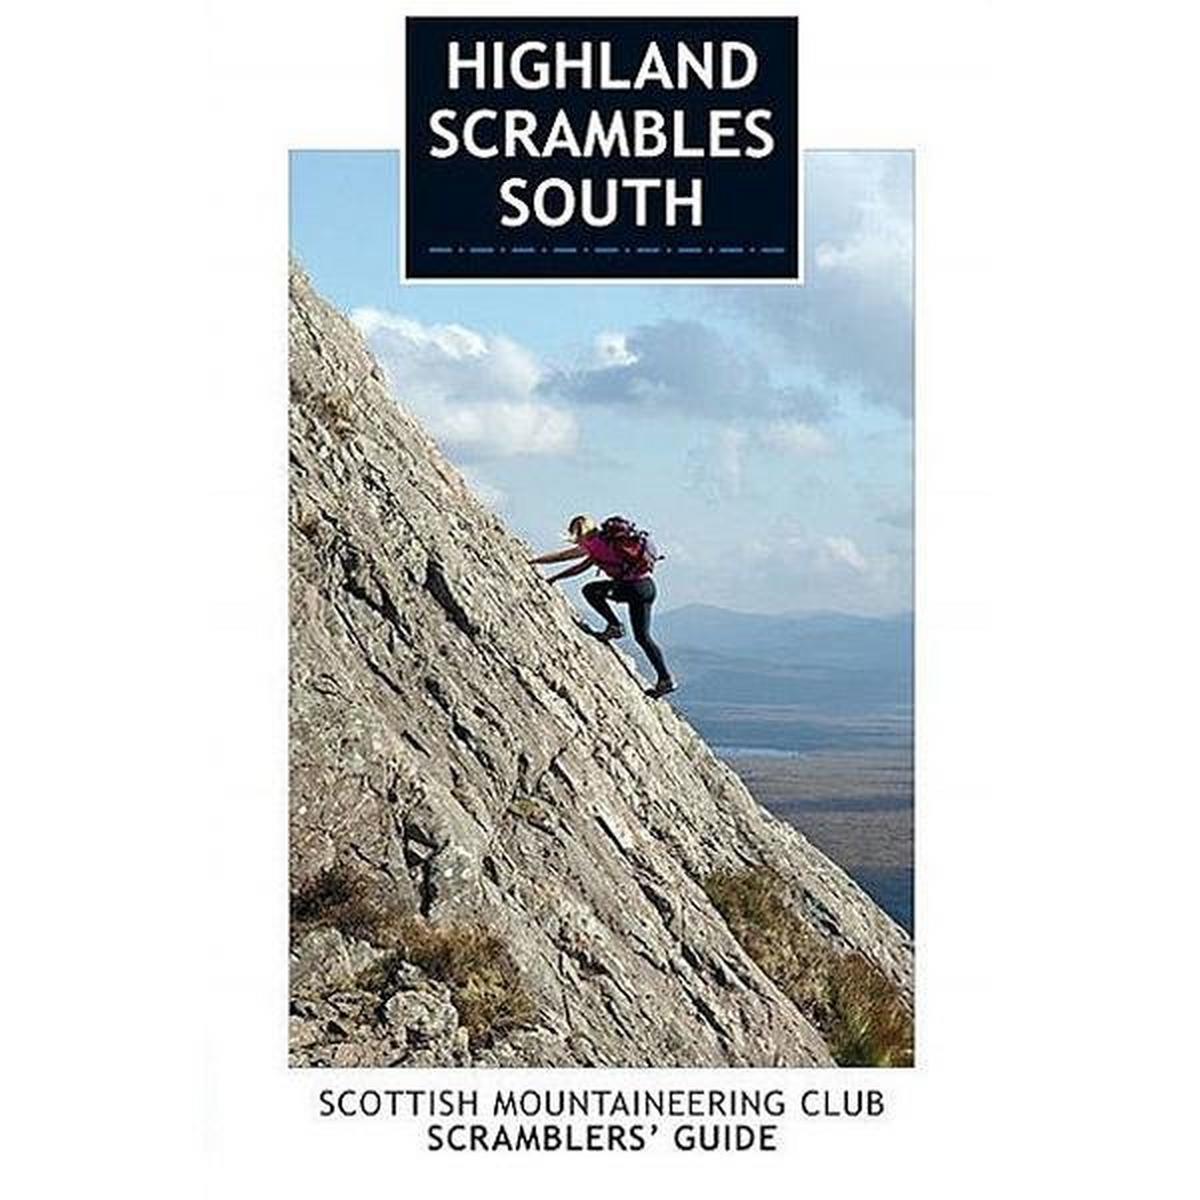 Cordee SMC Guide Book: Highland Scrambles South